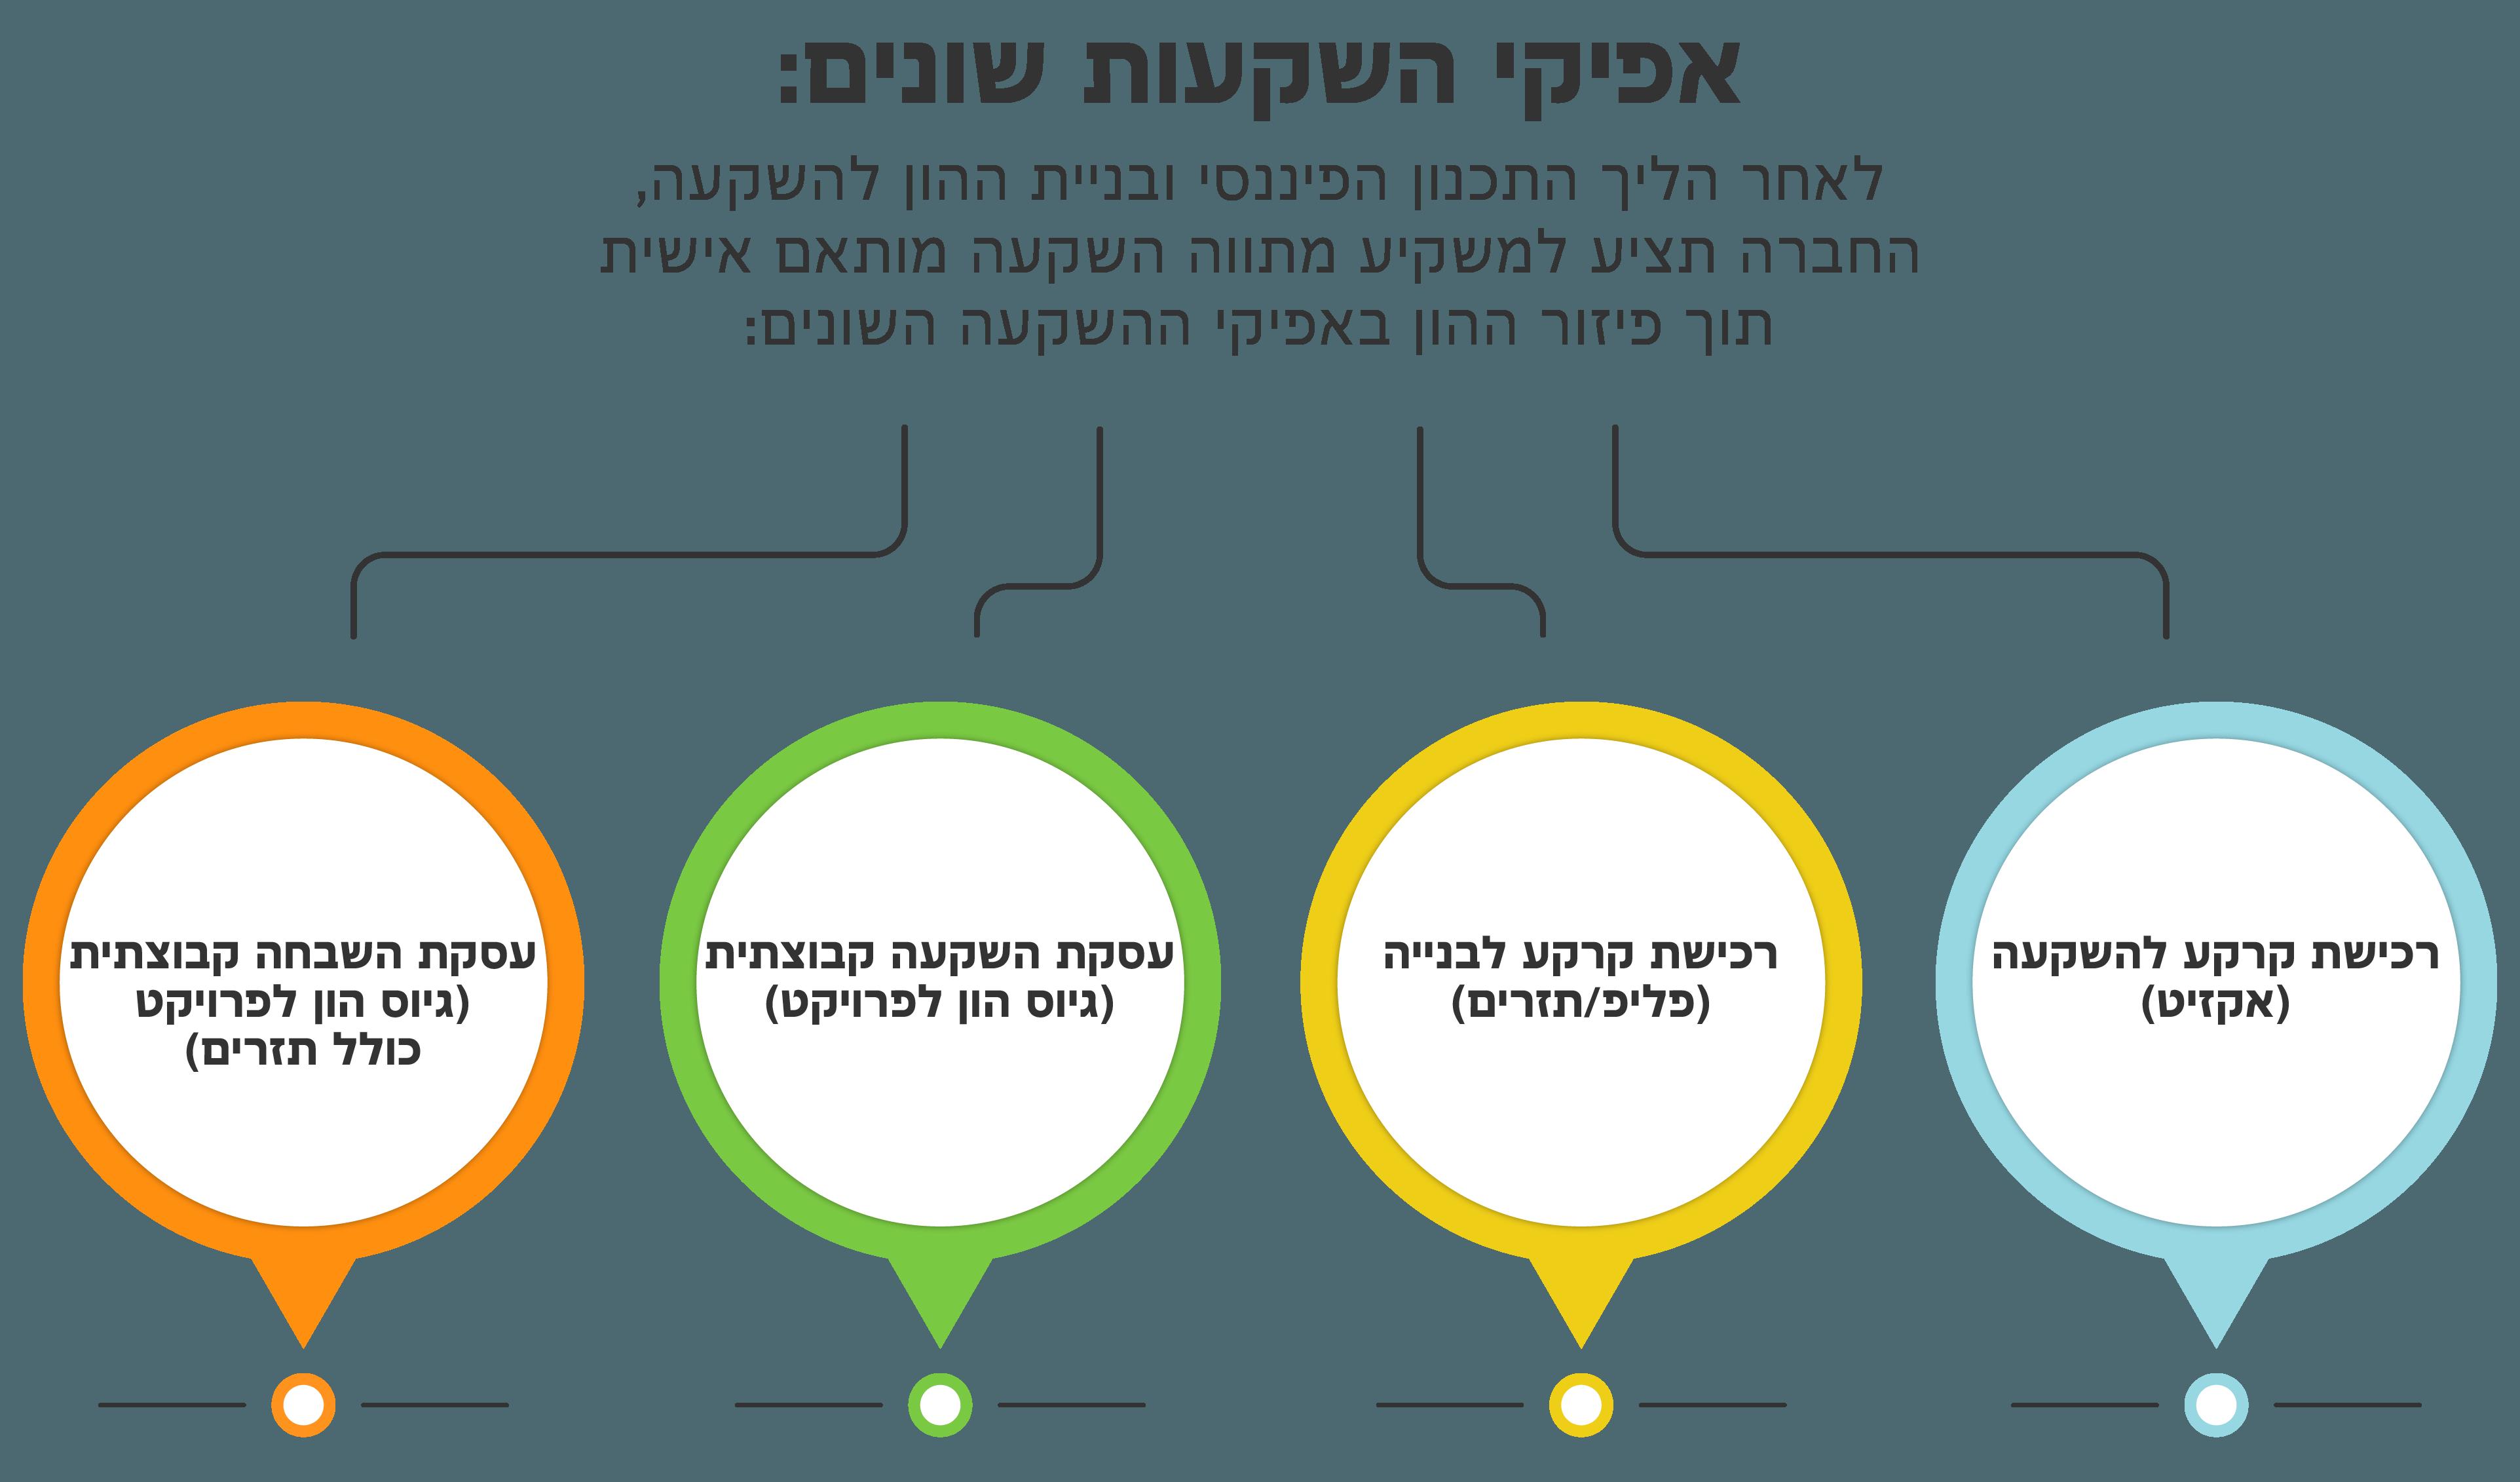 investo_steps_mobile_2